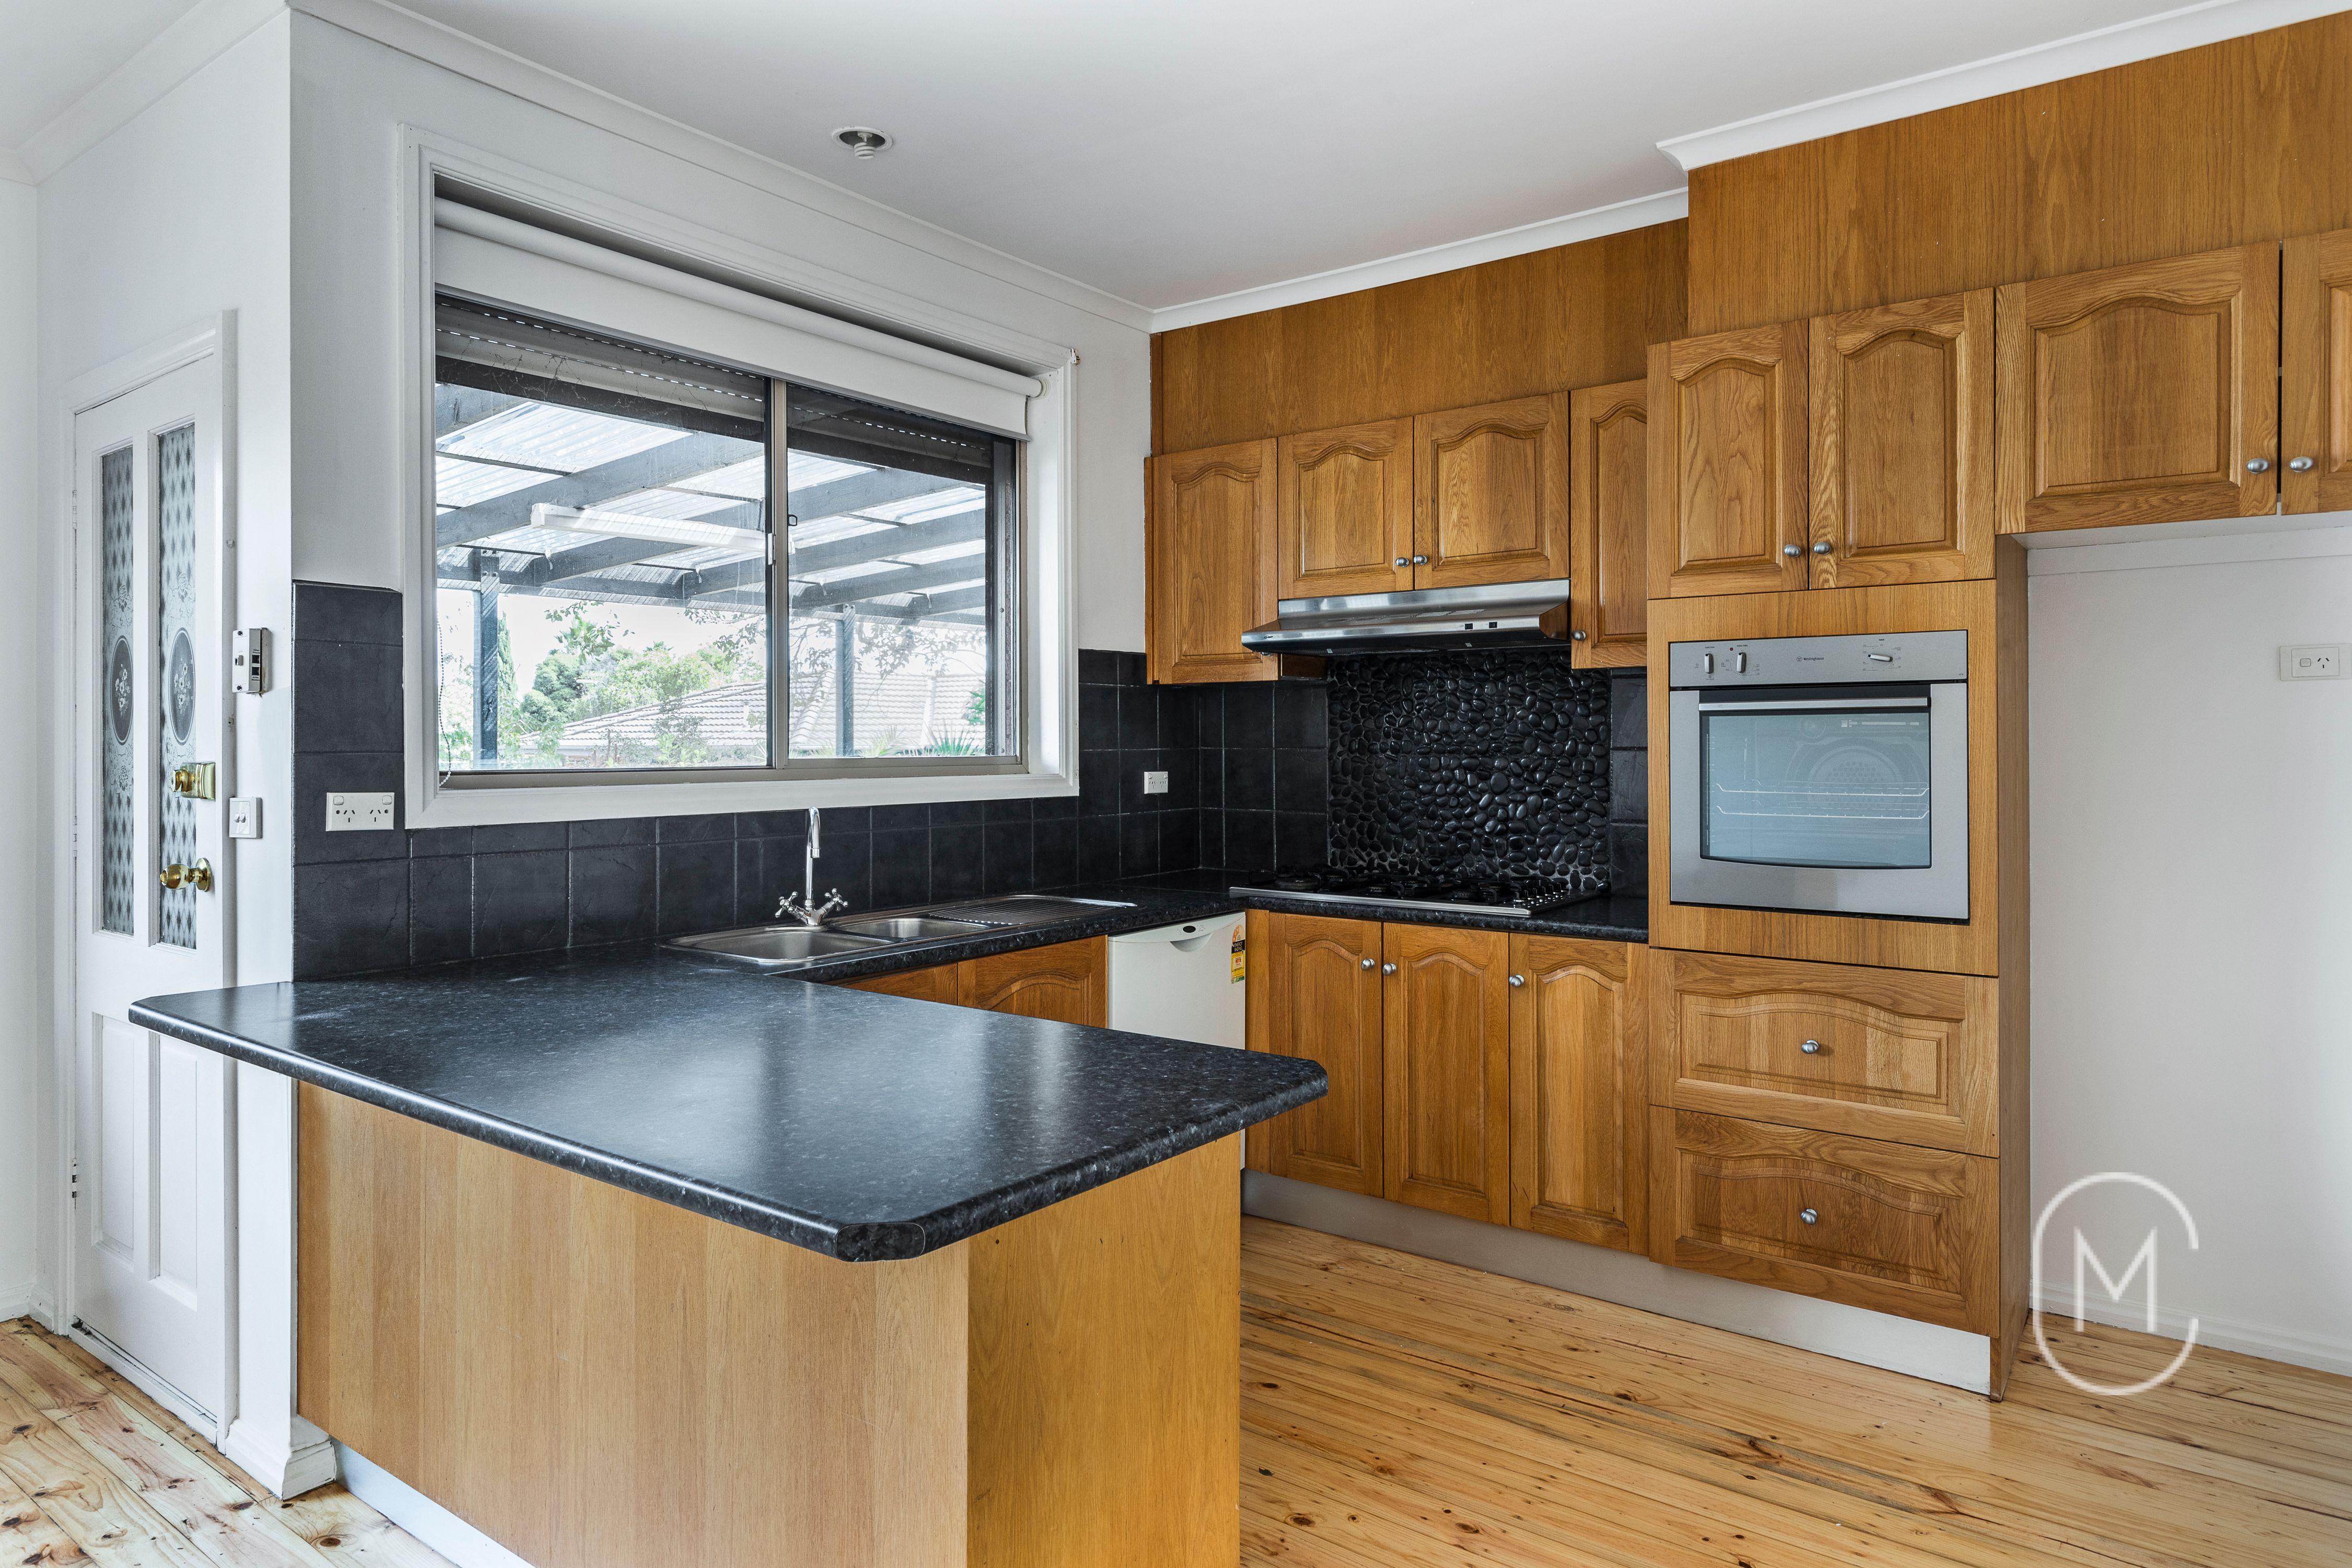 5 Santley Close, MILL PARK 3082